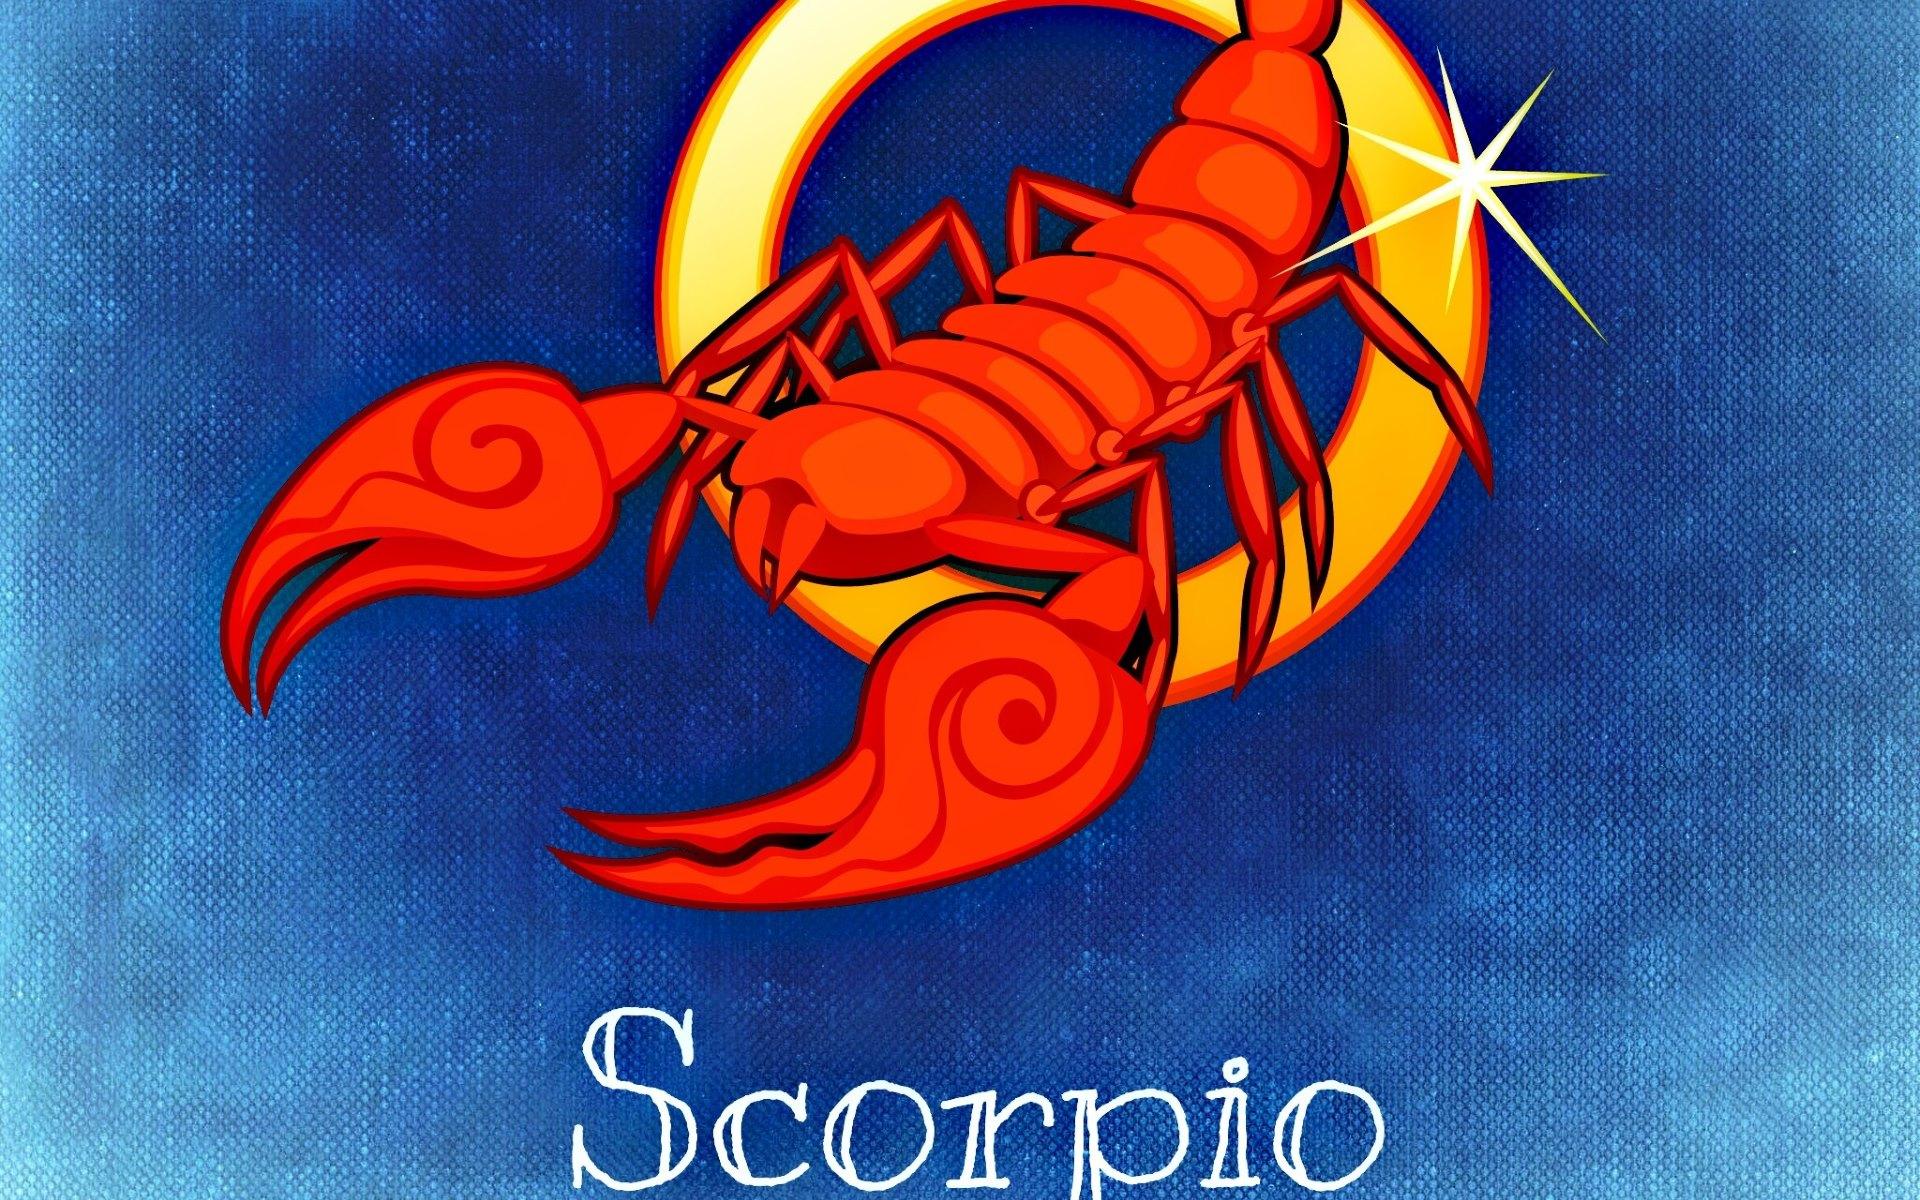 Horoscope - Scorpio